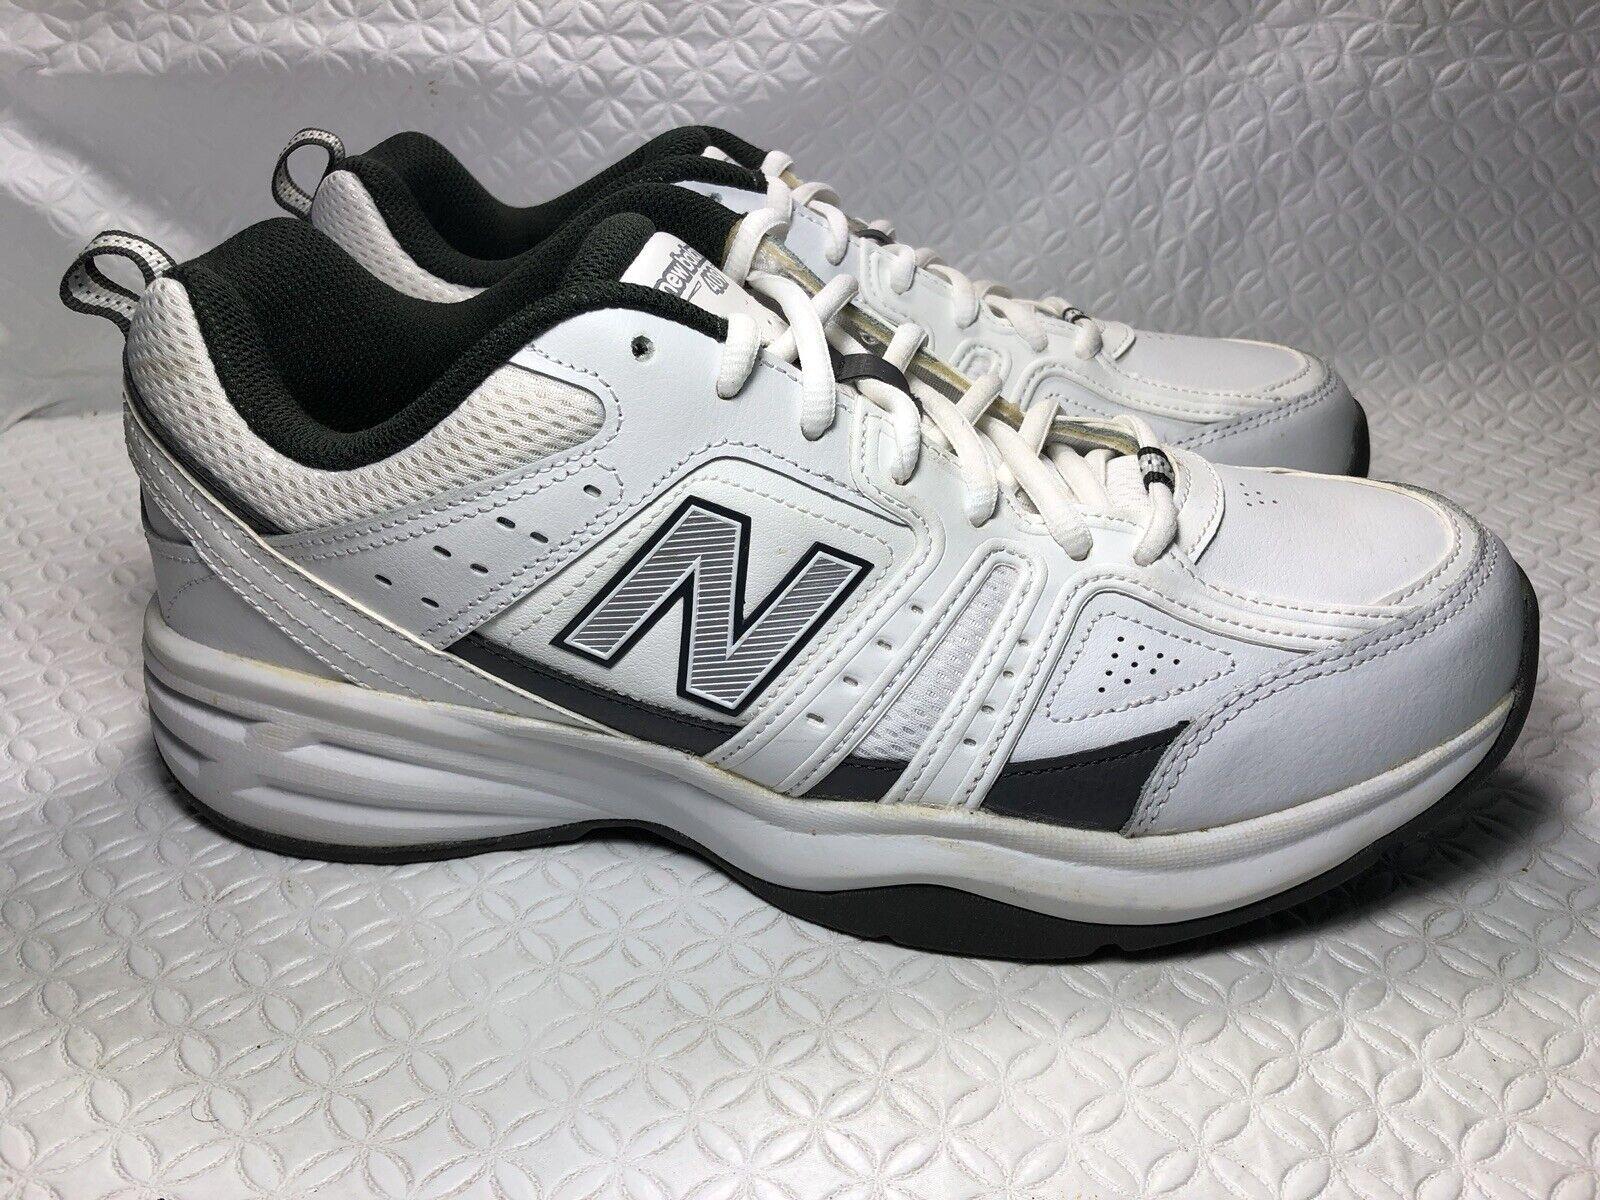 New Balance 409 Men's Walking Running shoes MX409WG2 Size-10.5